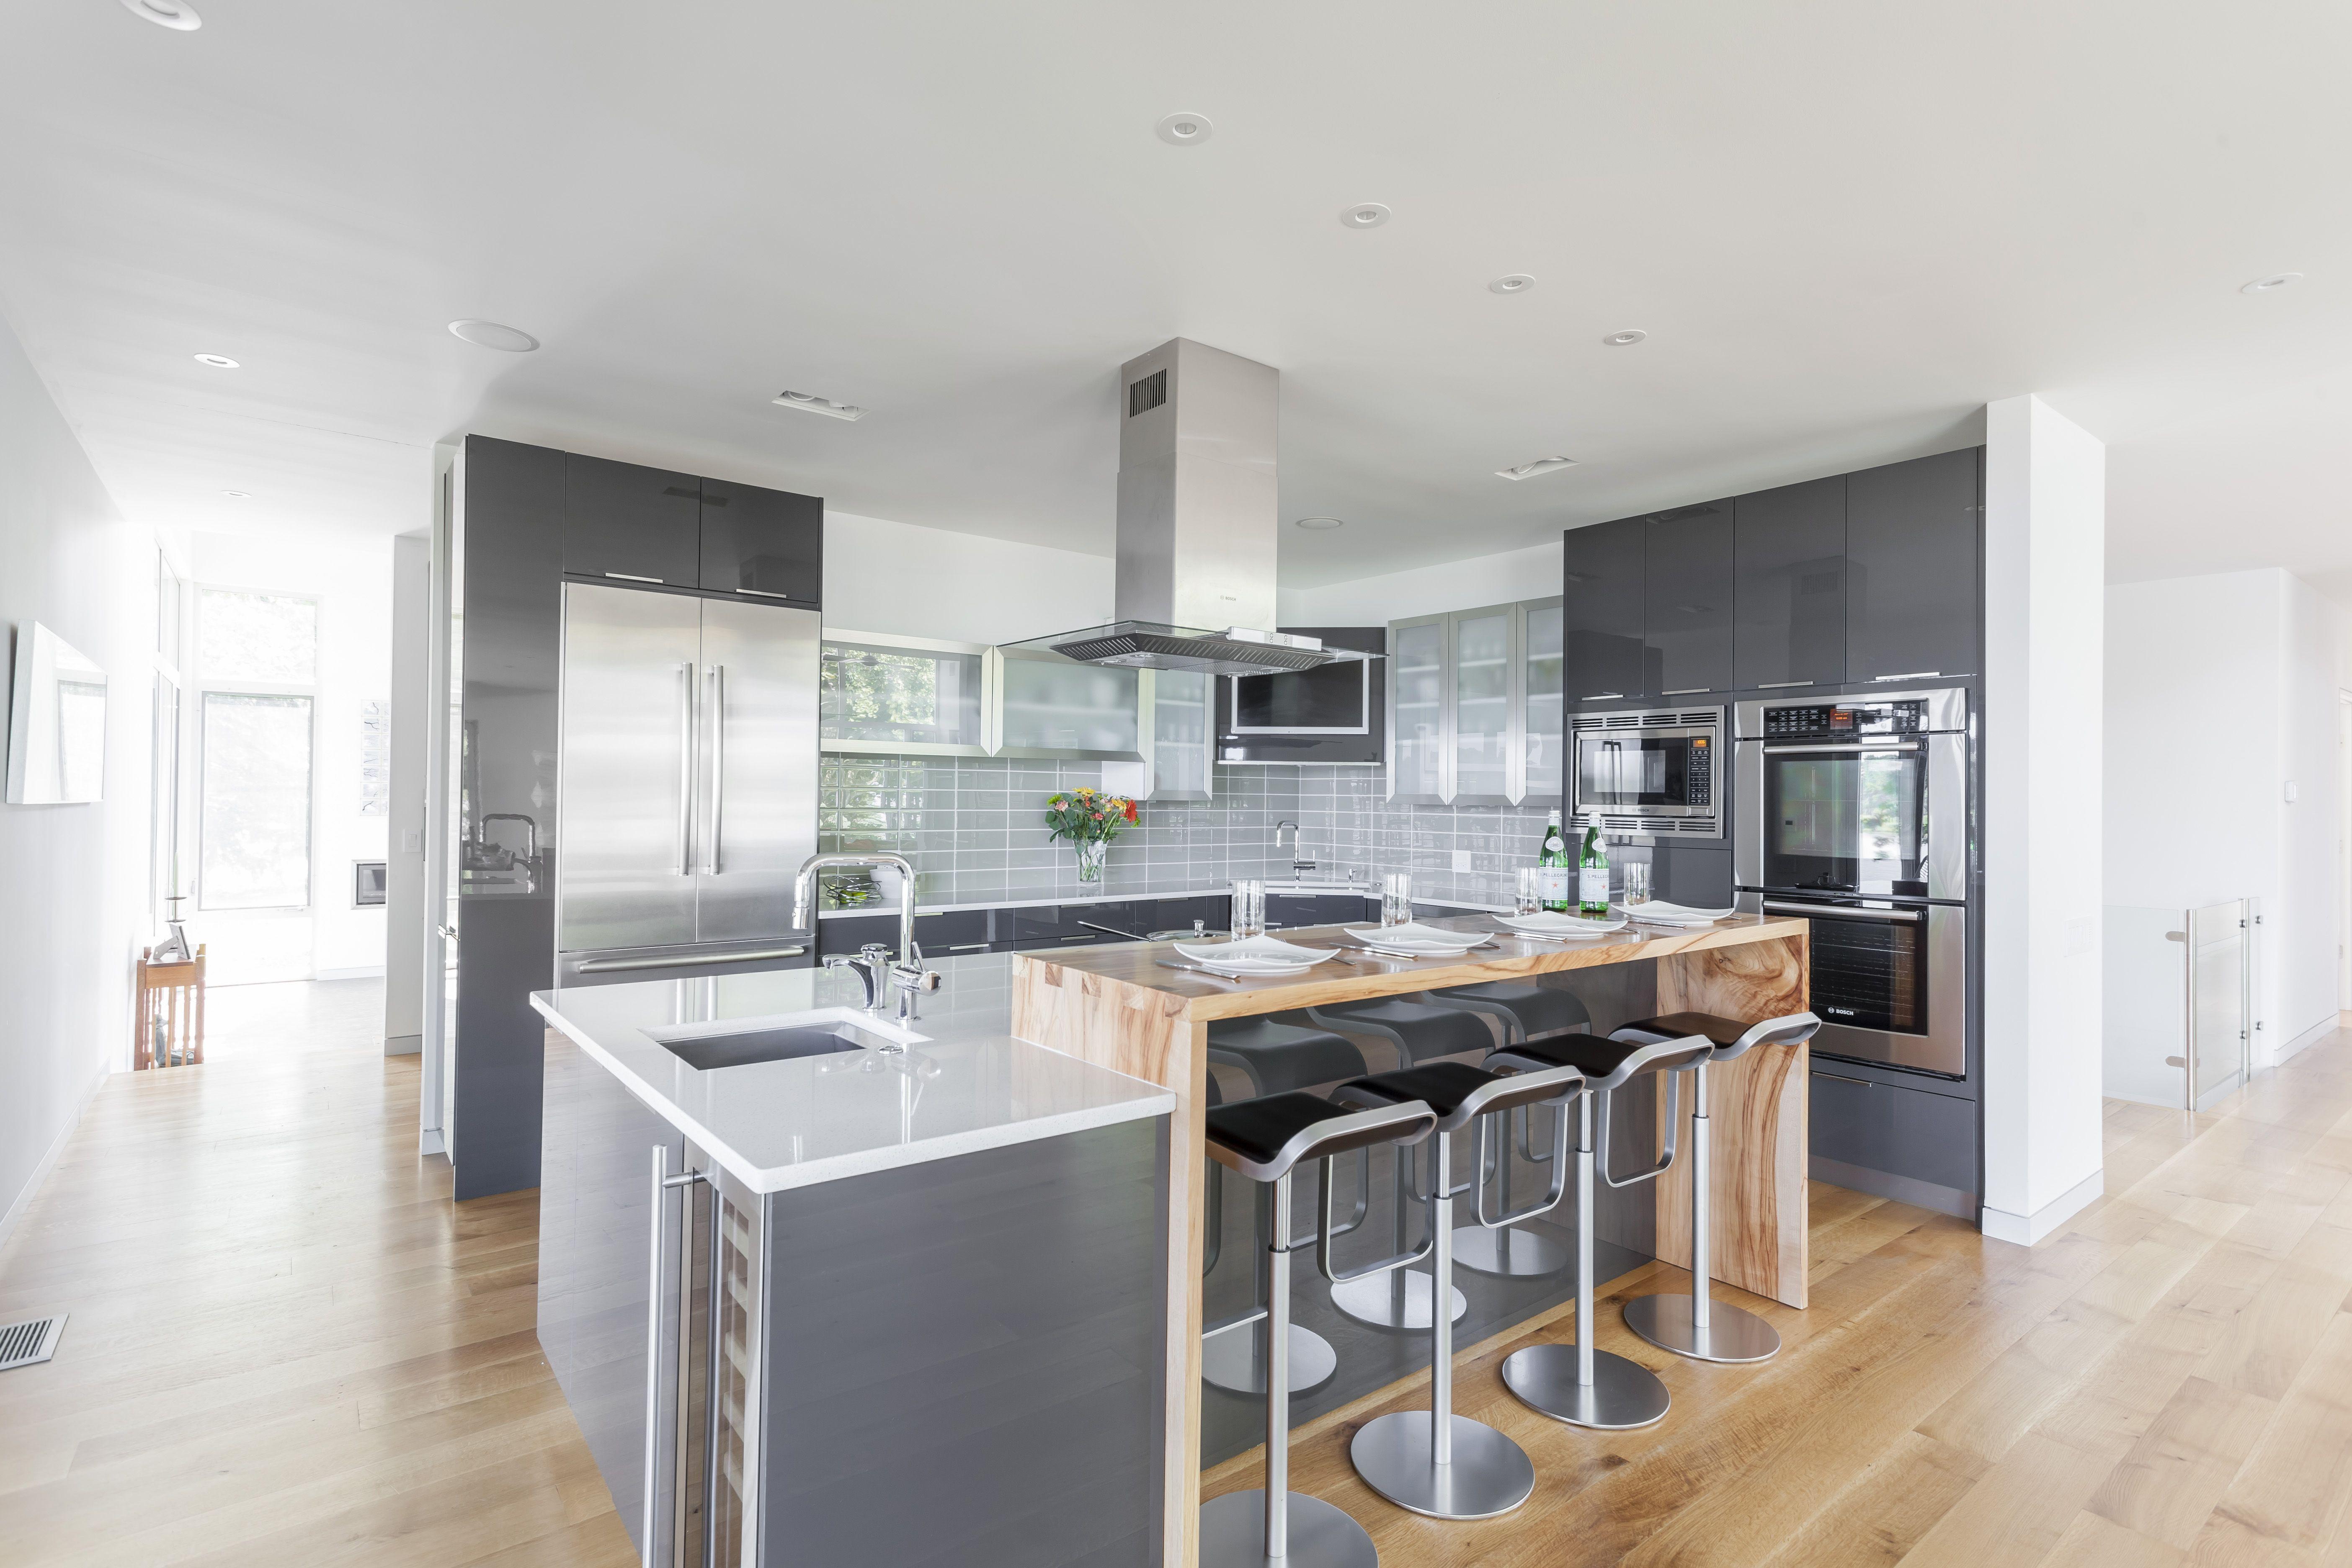 Elmwood Cabinetry: White Diamond Gloss | Kitchens: Glamorous Luxe ...